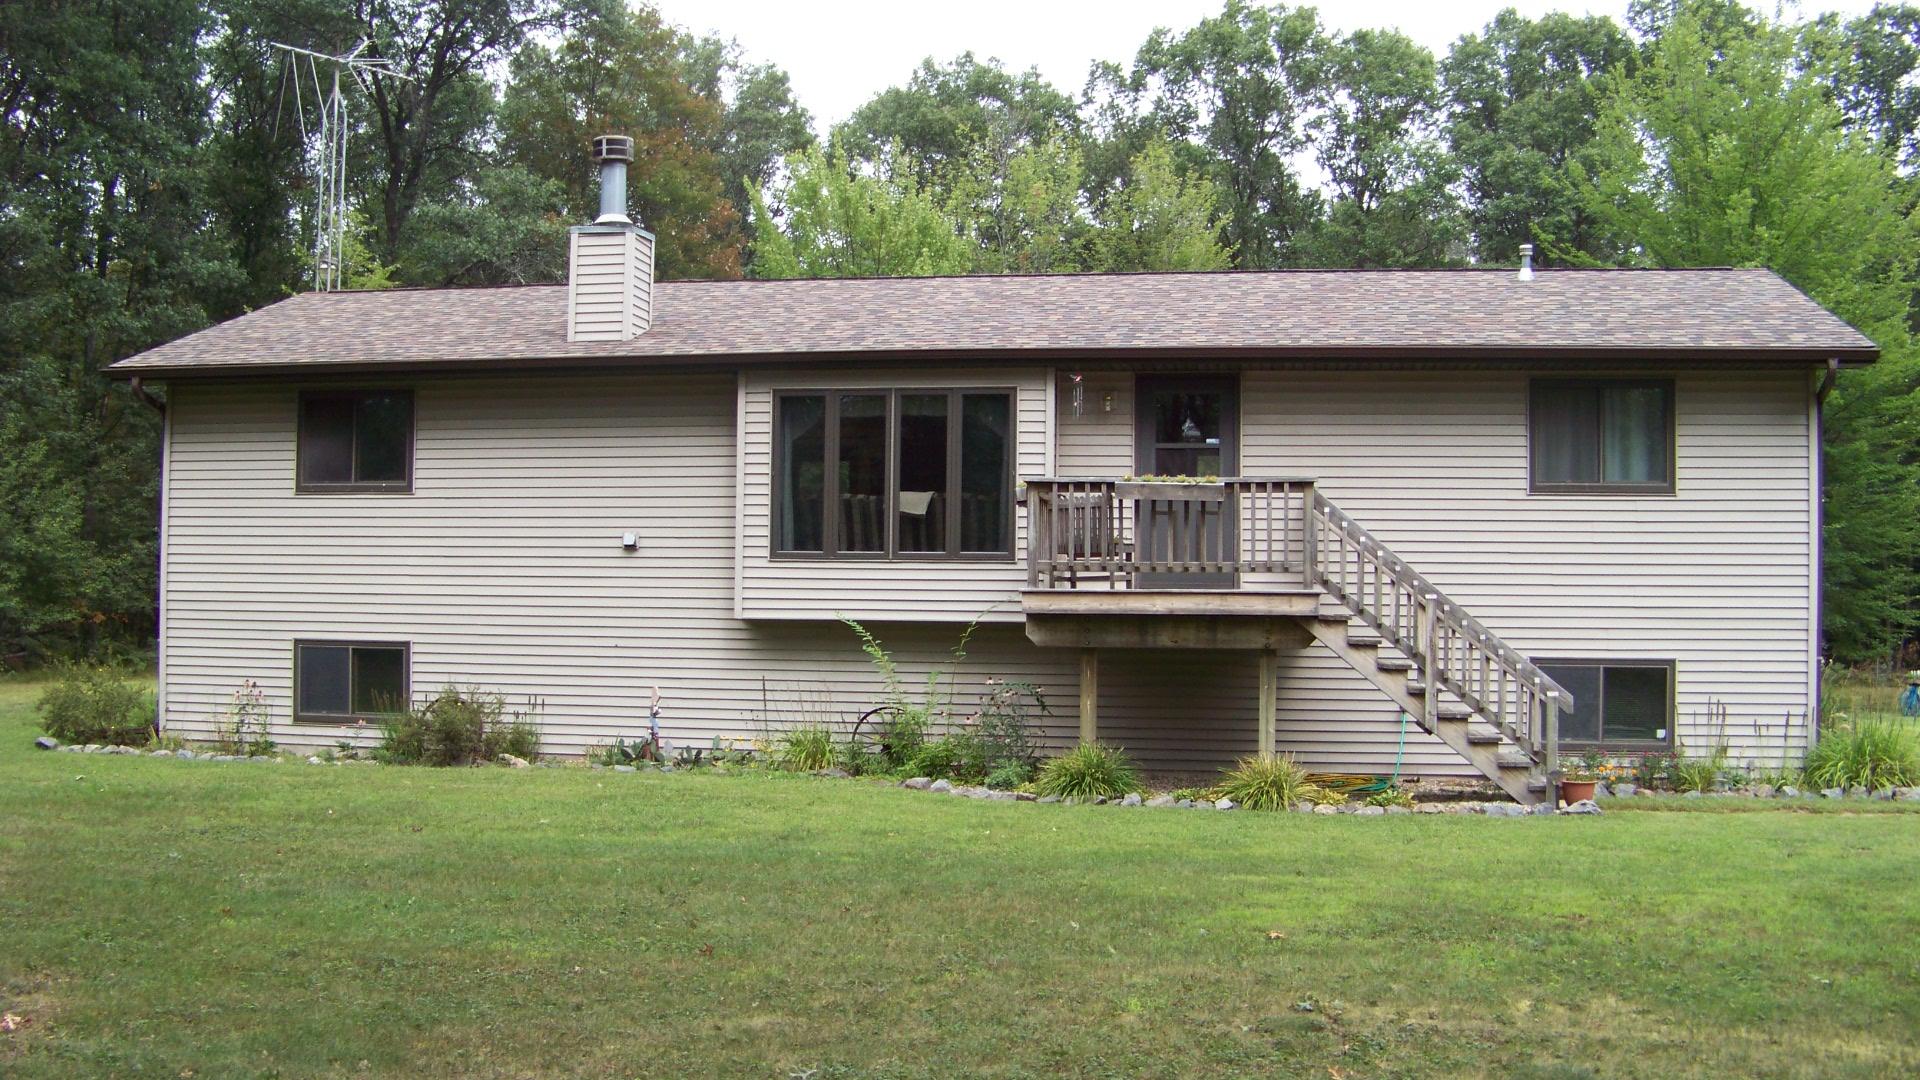 702 County Rd O, Hancock, Wisconsin 54943